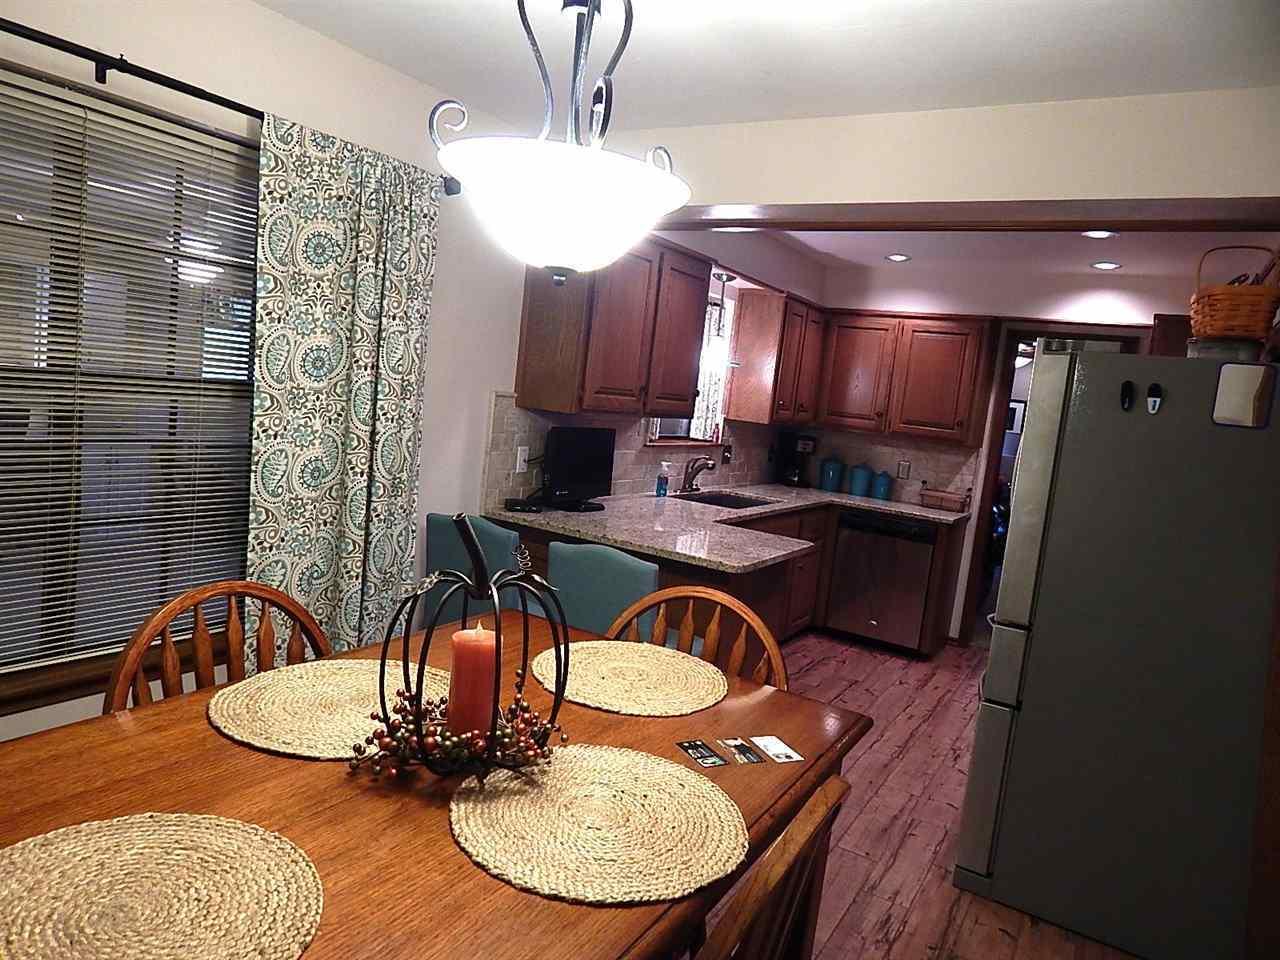 Sold Cross Sale W/ MLS | 2721 Wintergreen Ponca City, OK 74604 8